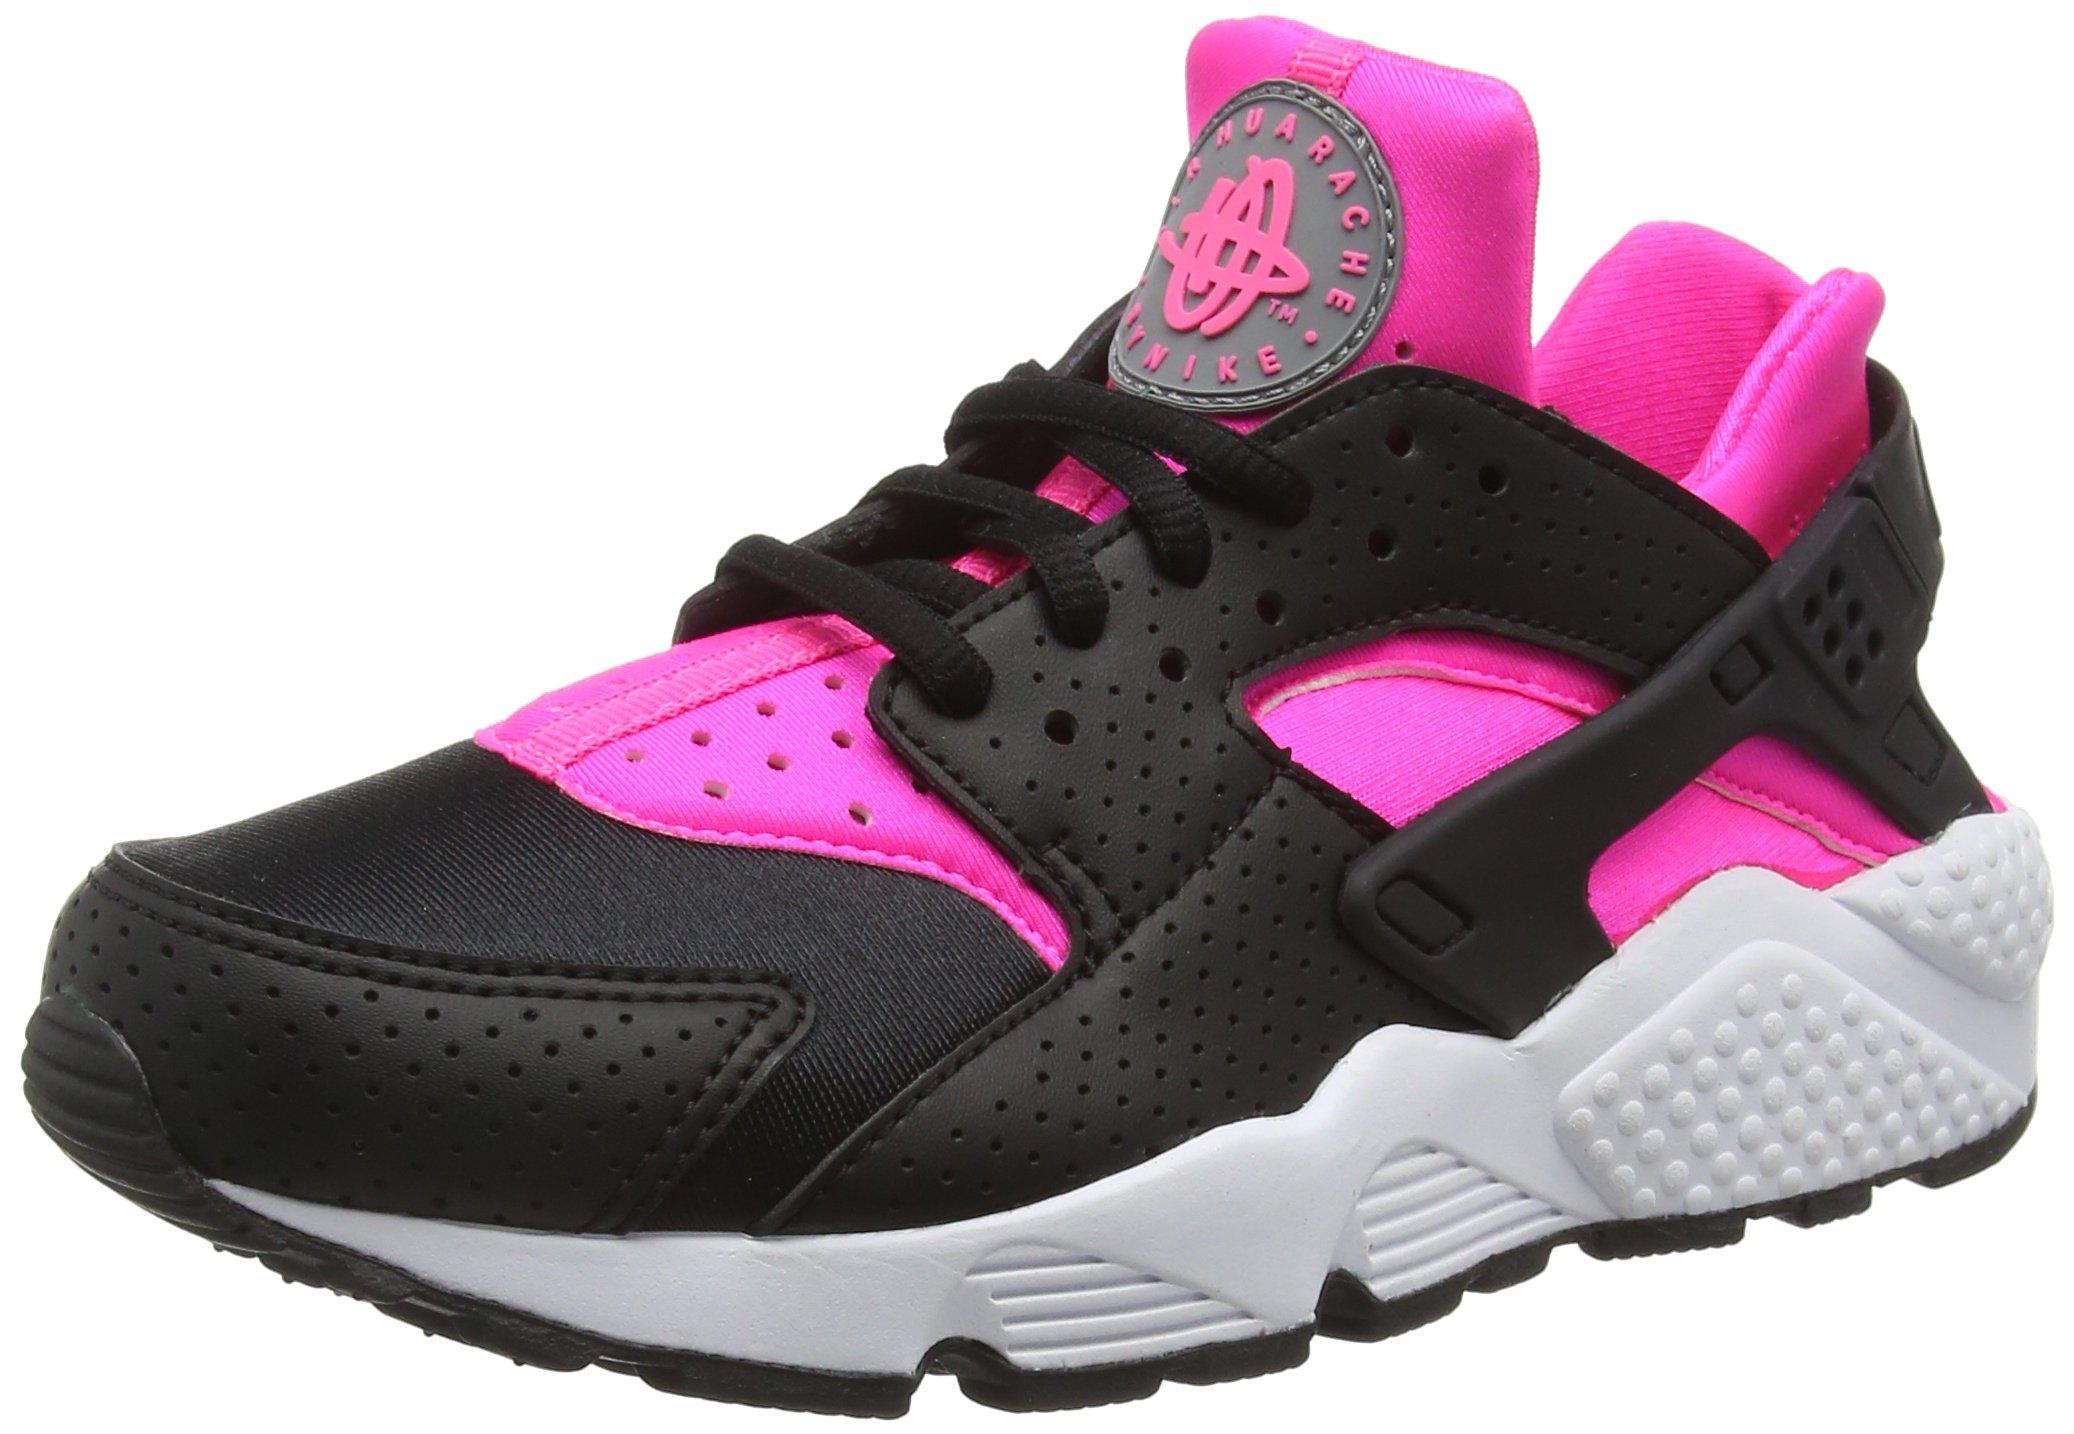 819E7EFNCfL - Nike Women's Wmns Air Huarache Running Shoes